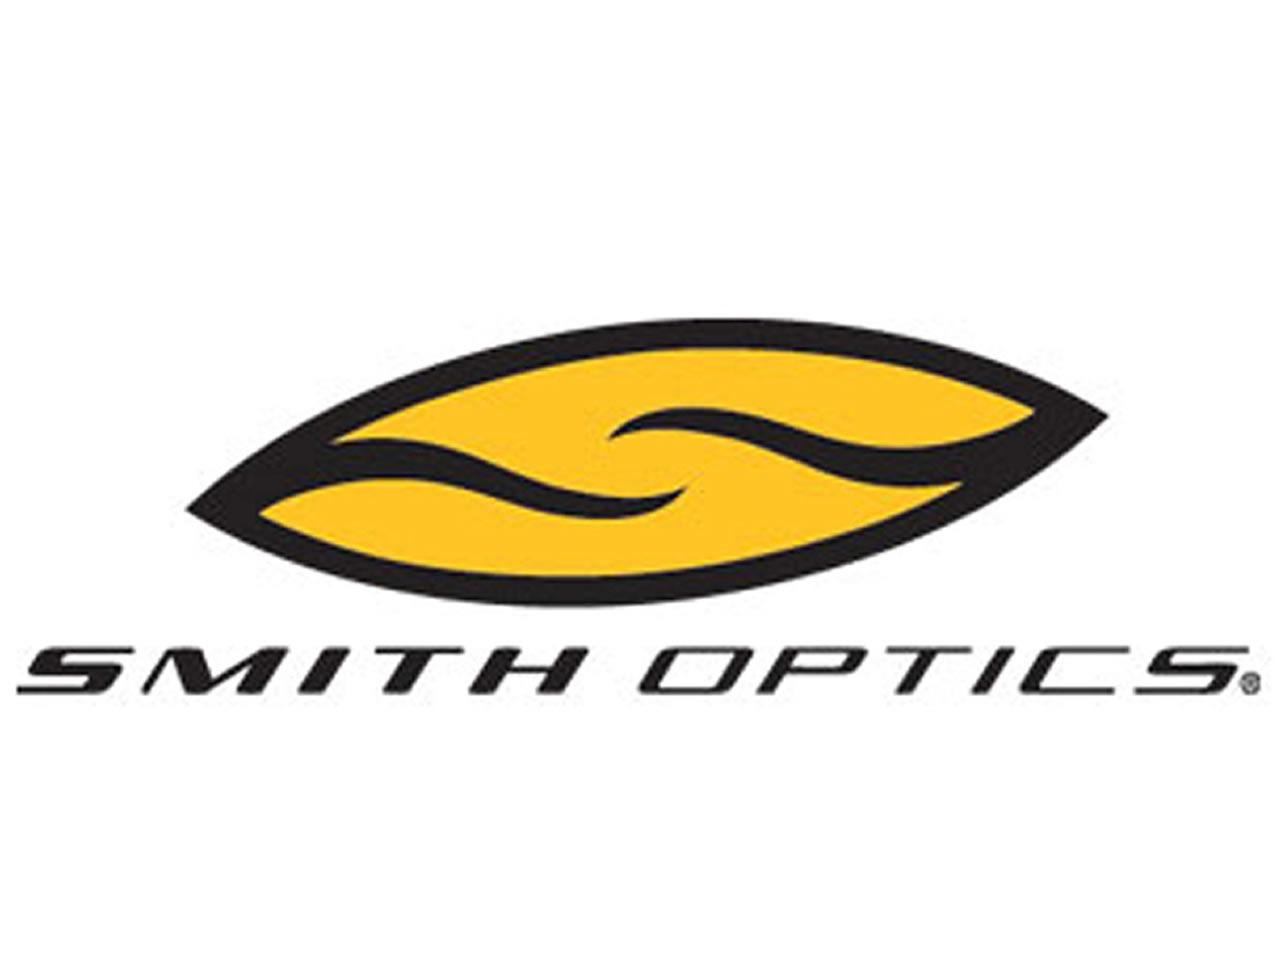 História da marca: Smith